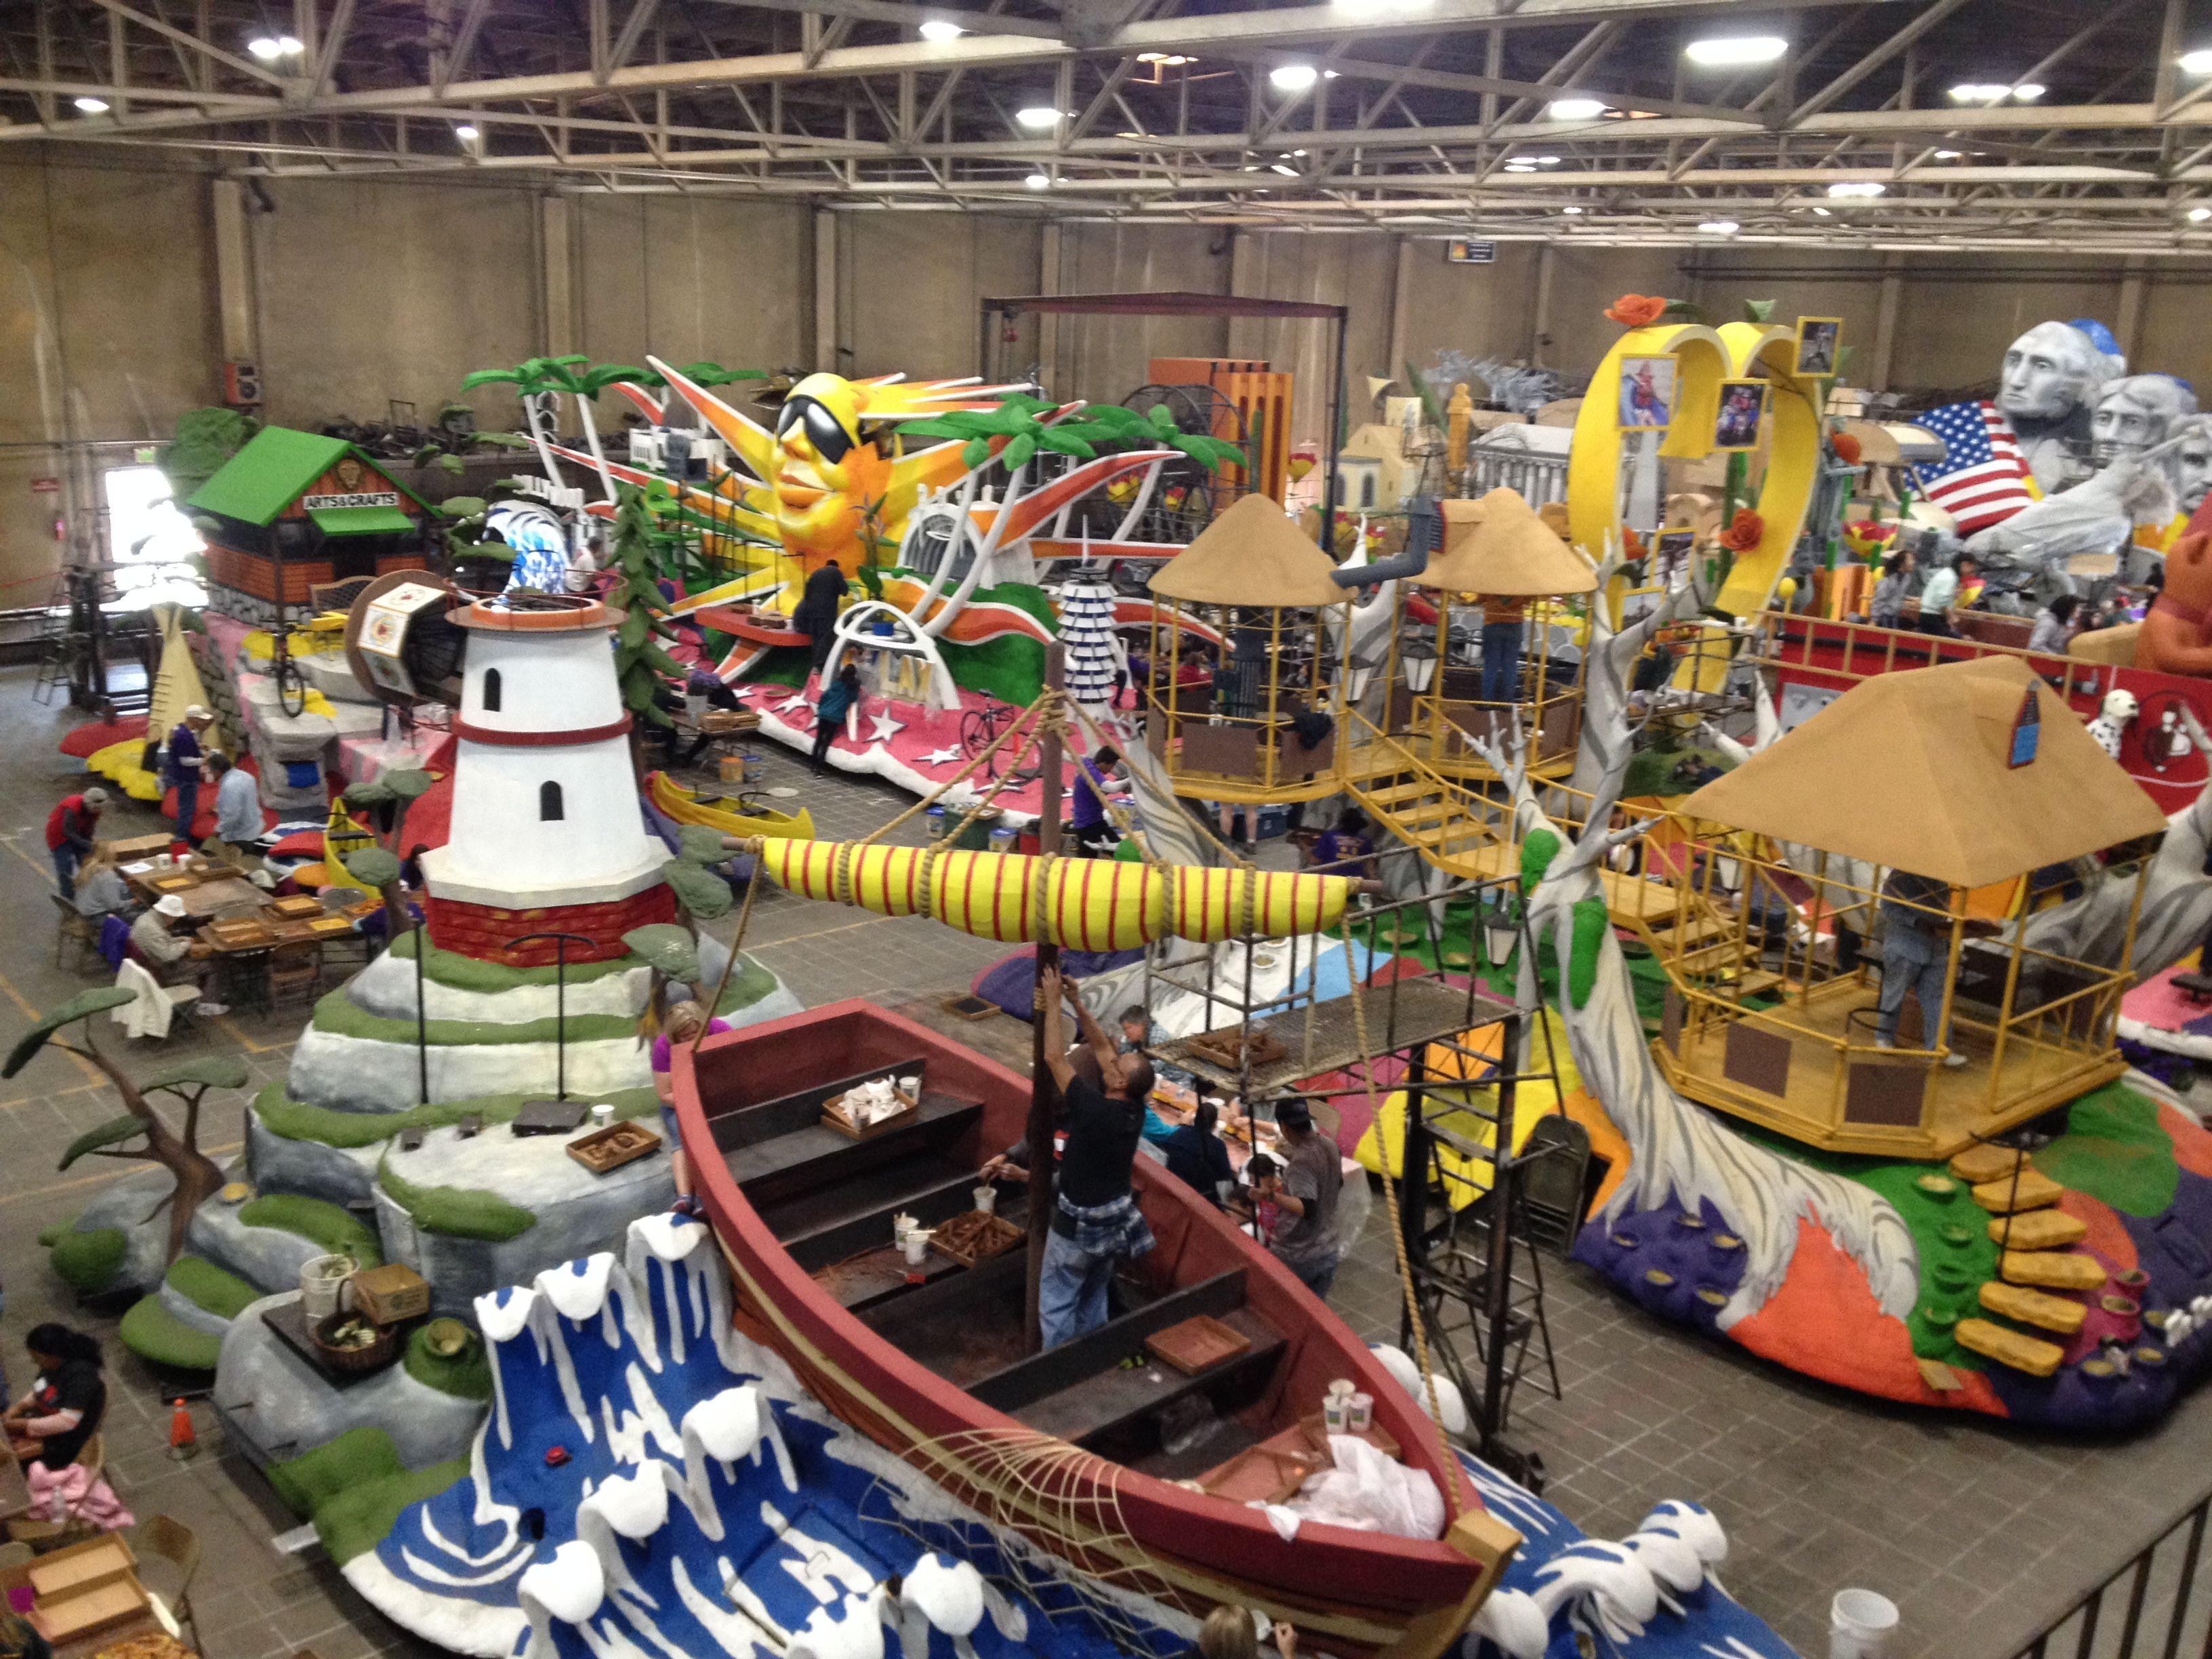 2016 Rose Parade floats, at Phoenix Decorating Company